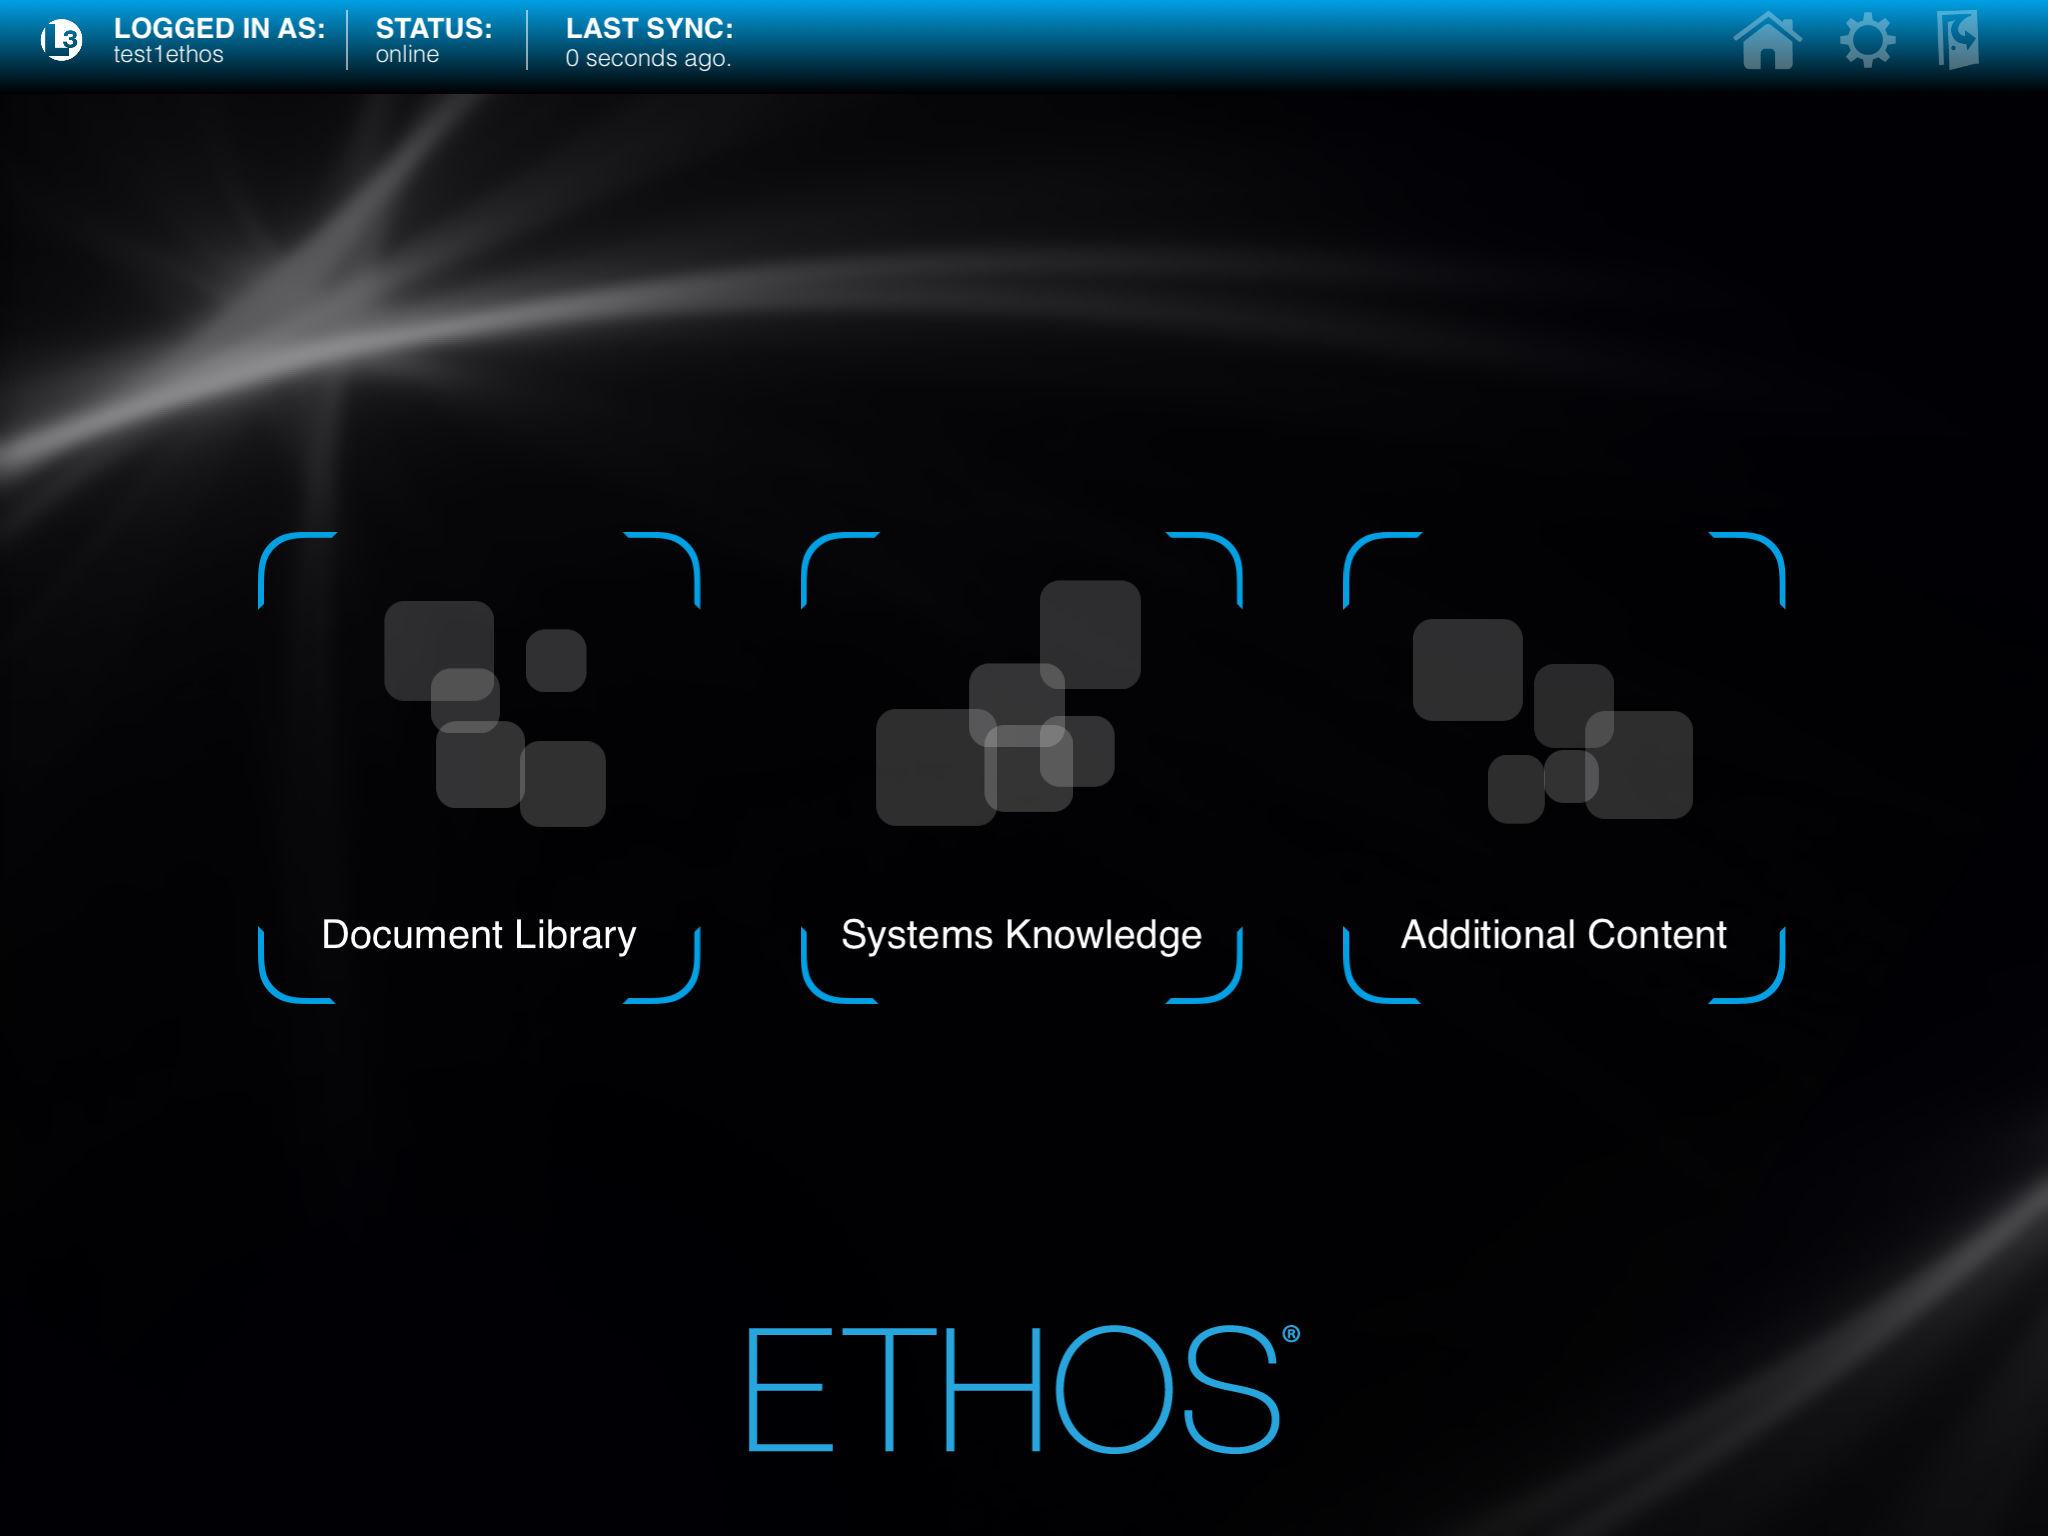 Aerosim ETHOS B737NG App Ranking and Store Data   App Annie